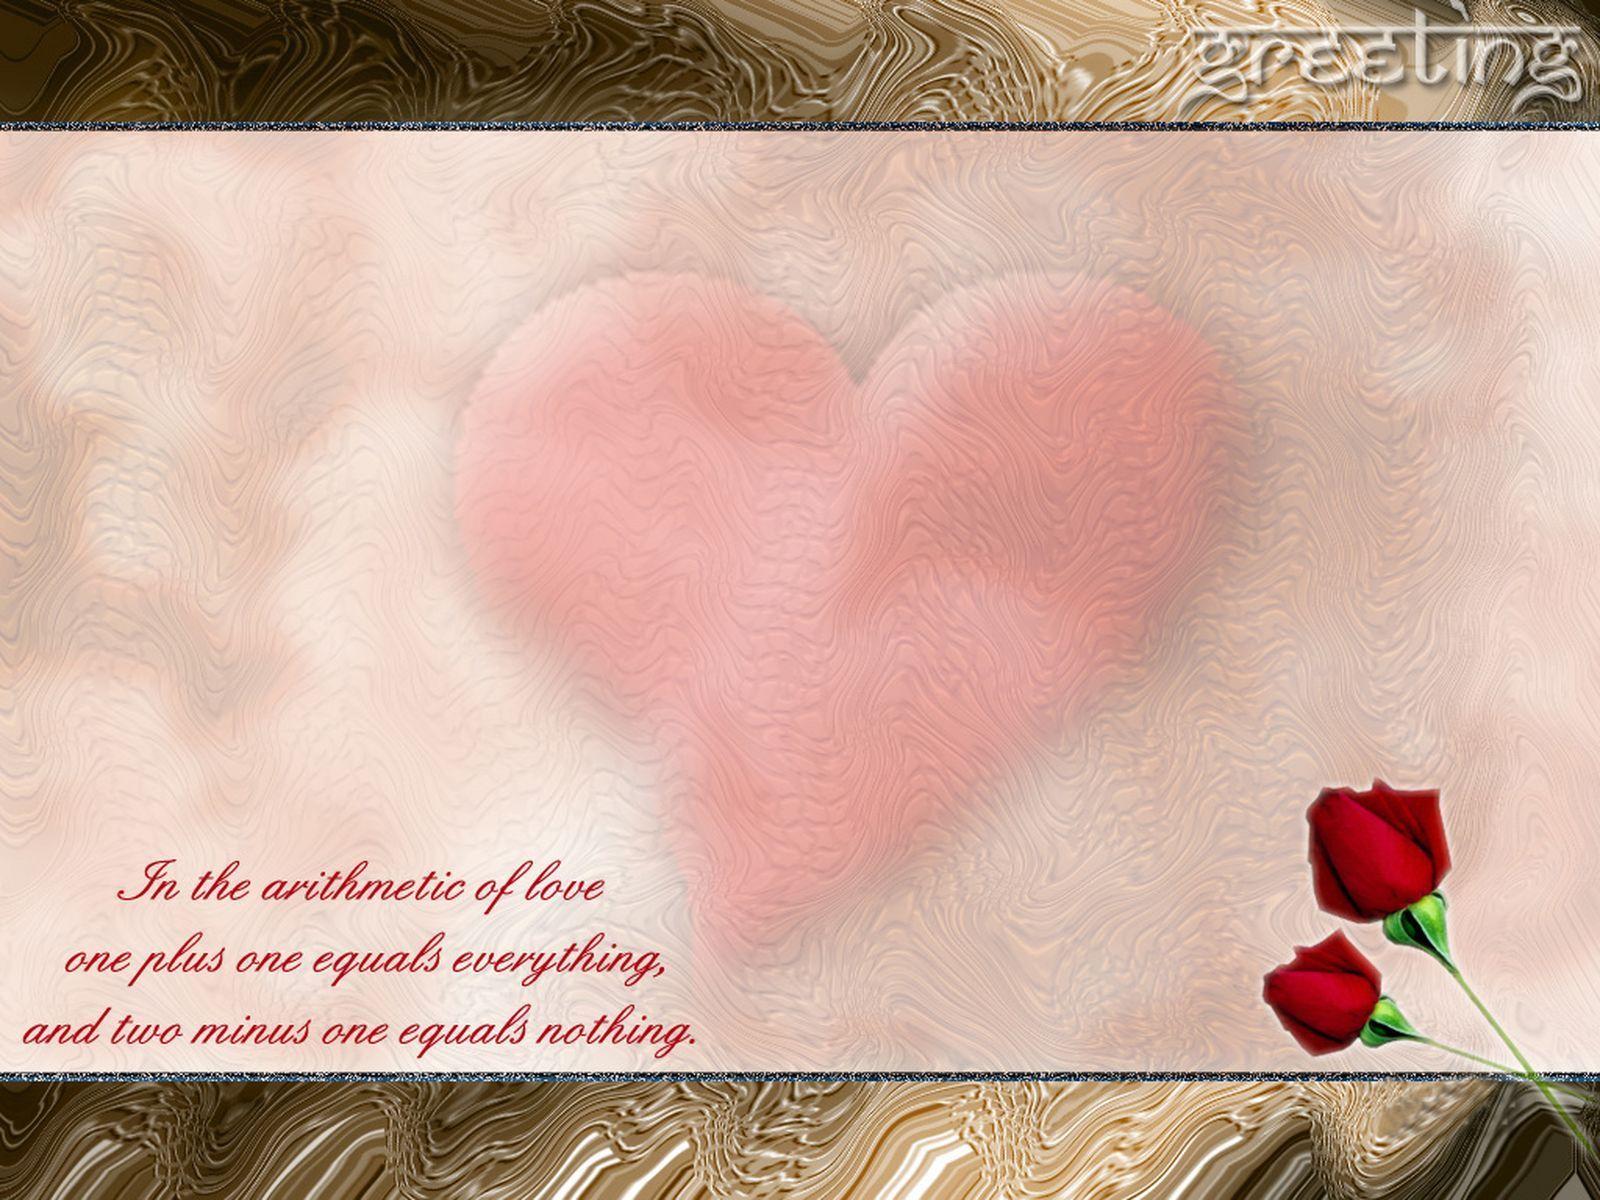 http://3.bp.blogspot.com/-AcJjc4uubbc/T-15ifnJa2I/AAAAAAAAB0o/sXTOyBegN54/s1600/Love_Quotes_Wallpapers.jpg